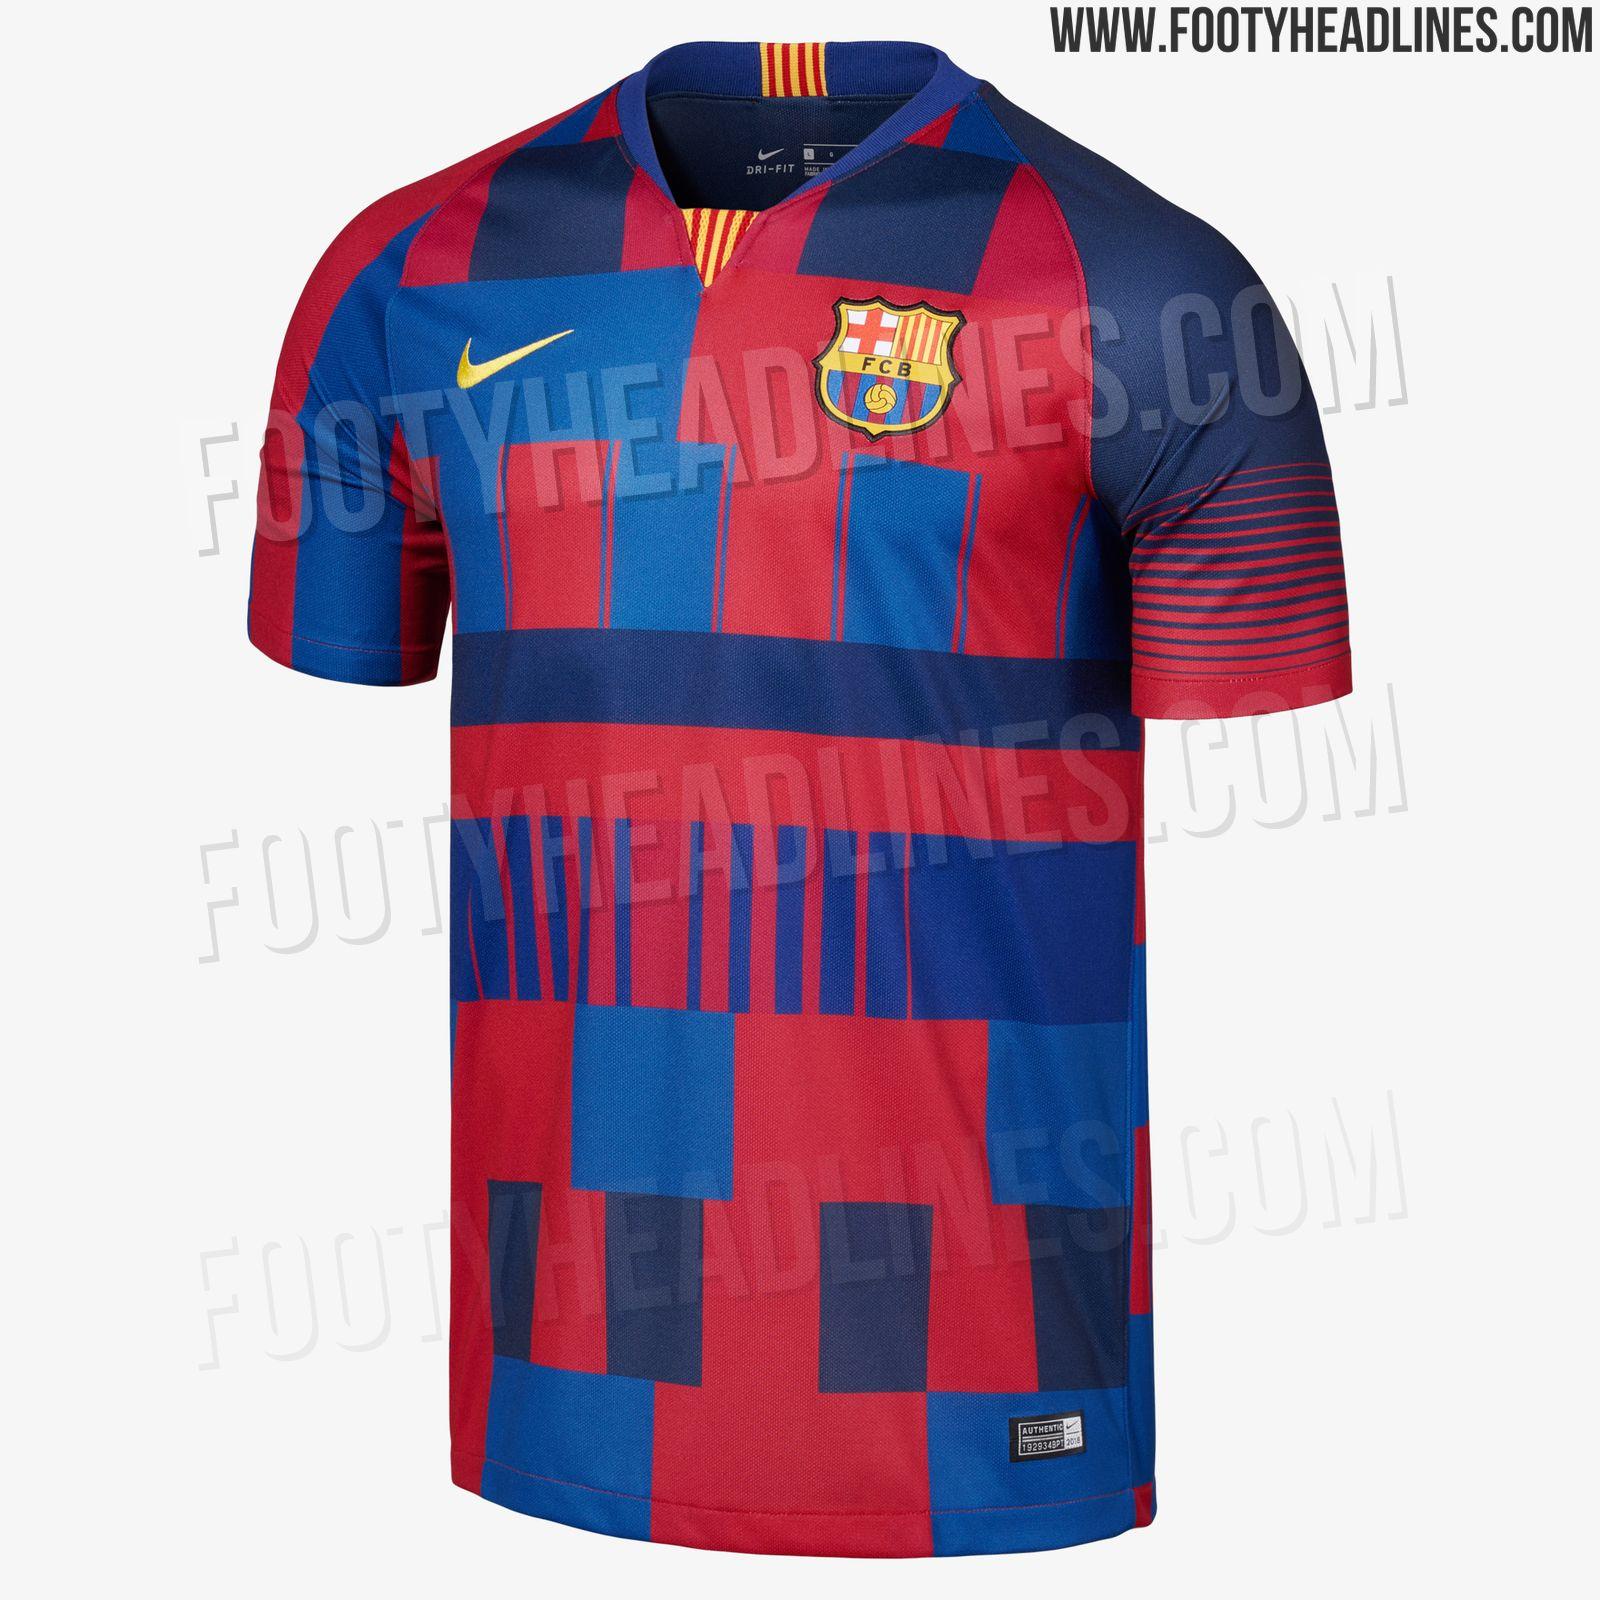 Camiseta Nike 20 años FC Barcelona